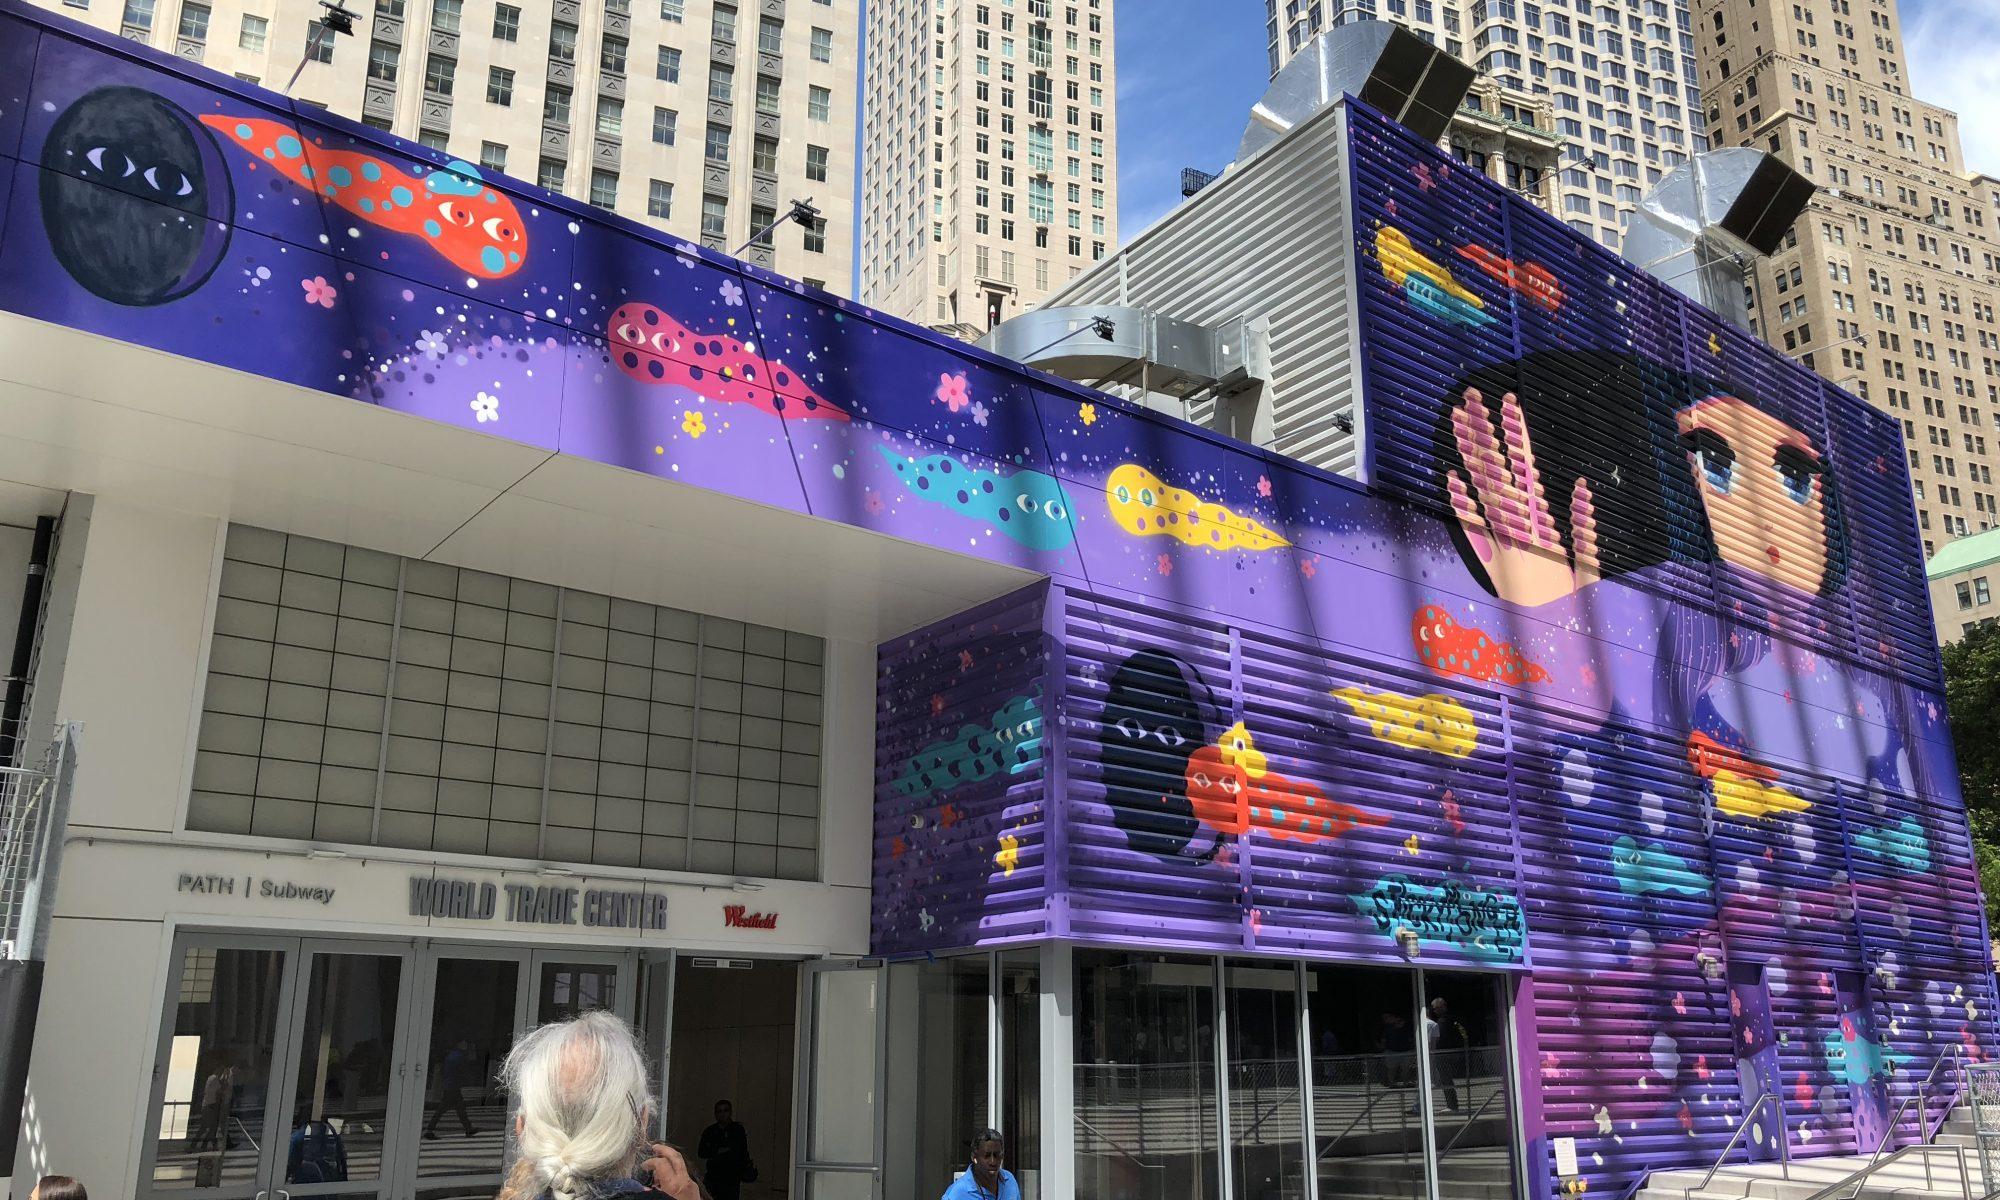 New Street Murals Animate World Trade Center in New York City